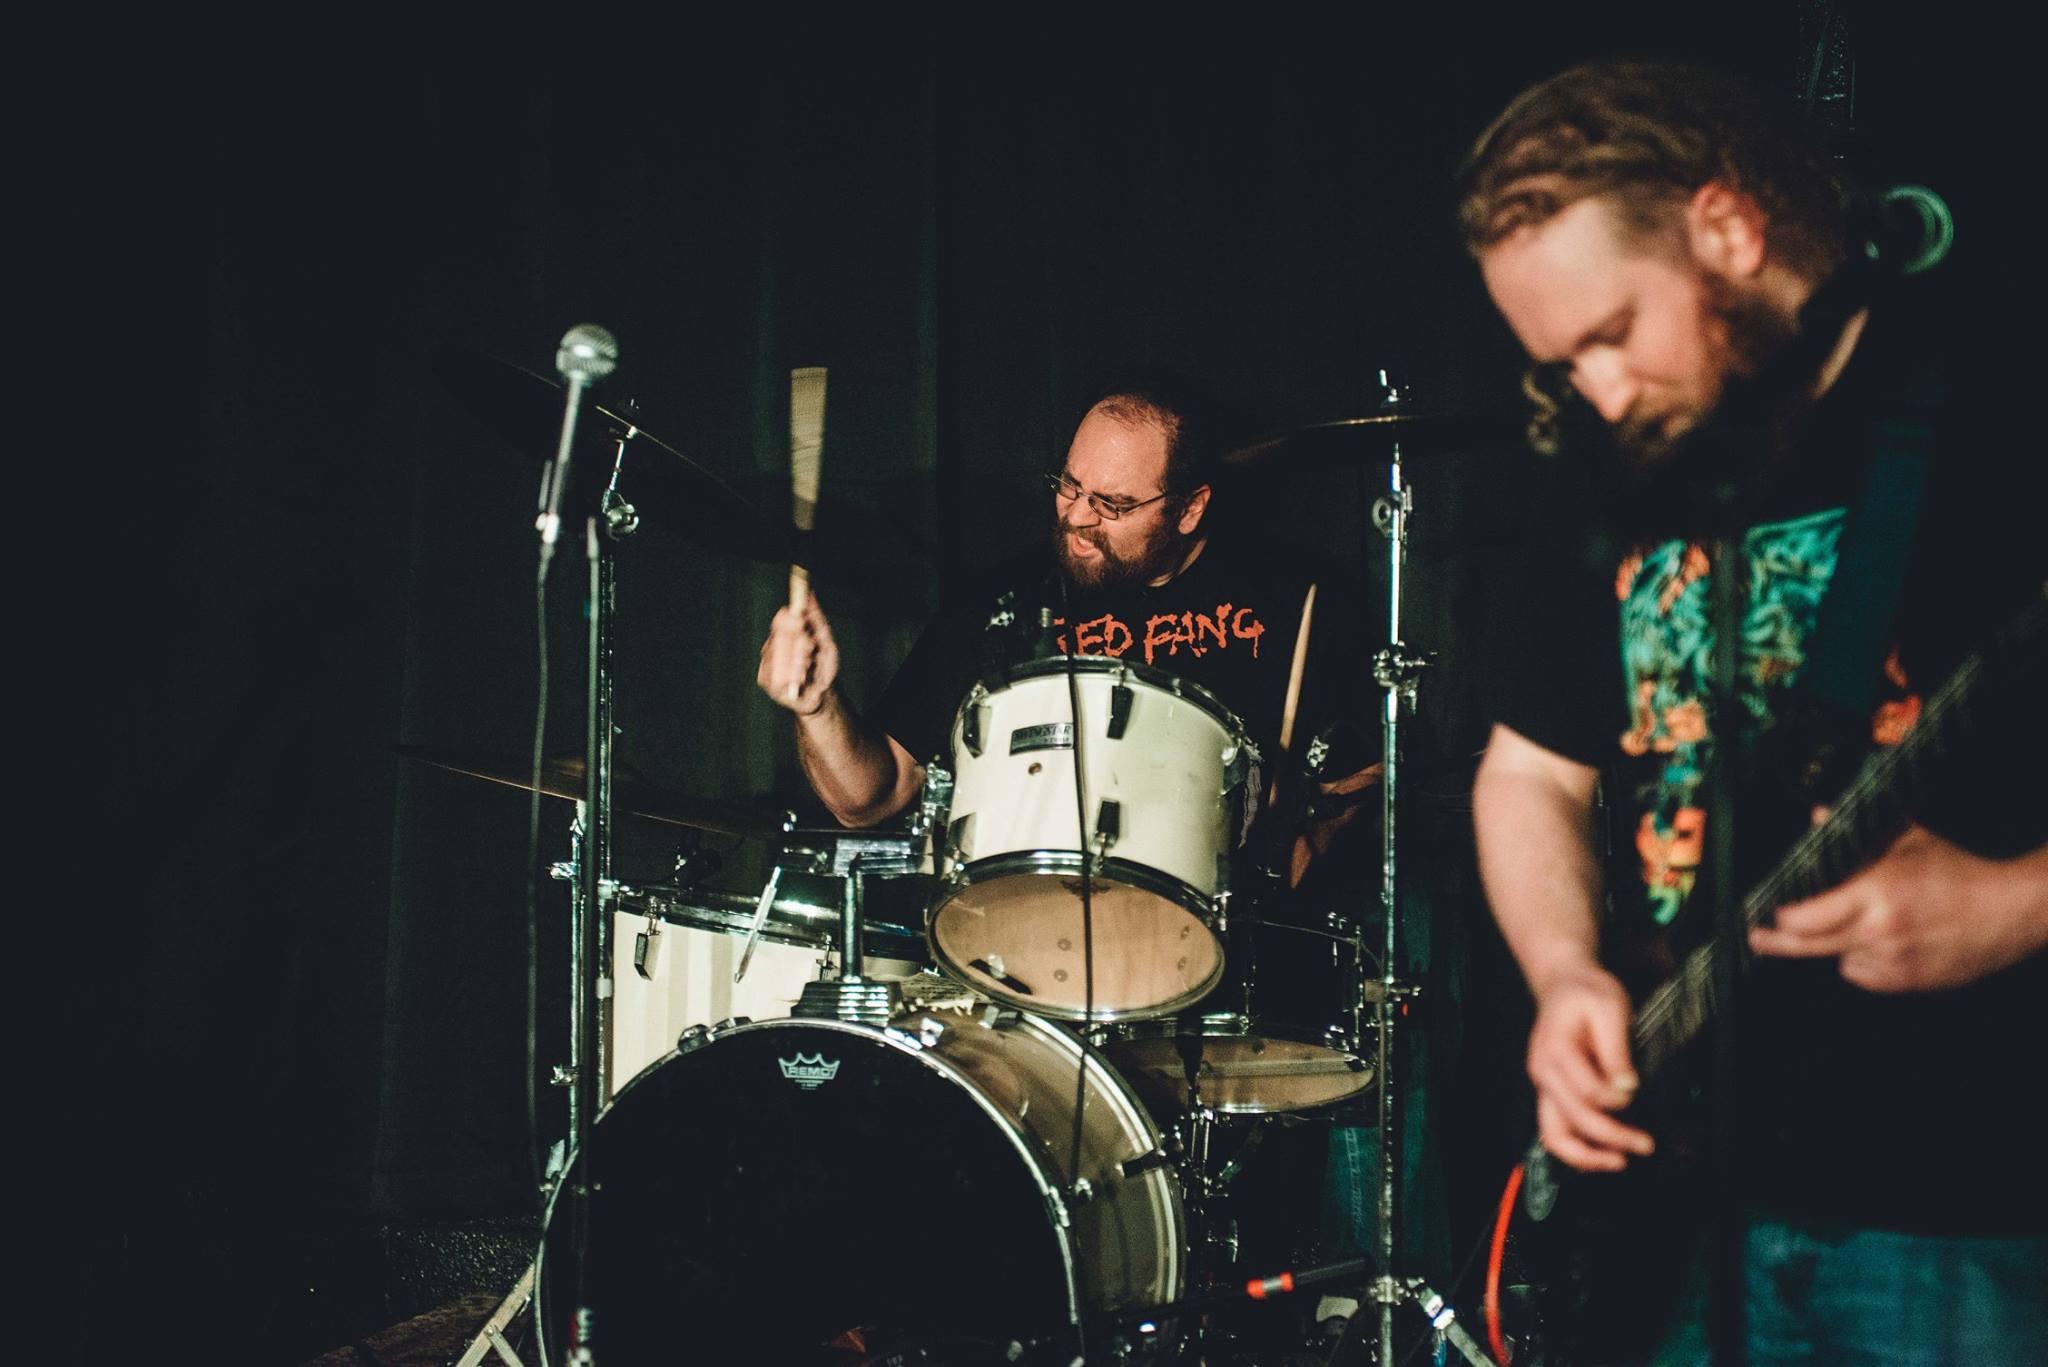 kaiju-daisenso-the-hub-island-park-ny-LI-drummer-grindcore.JPG